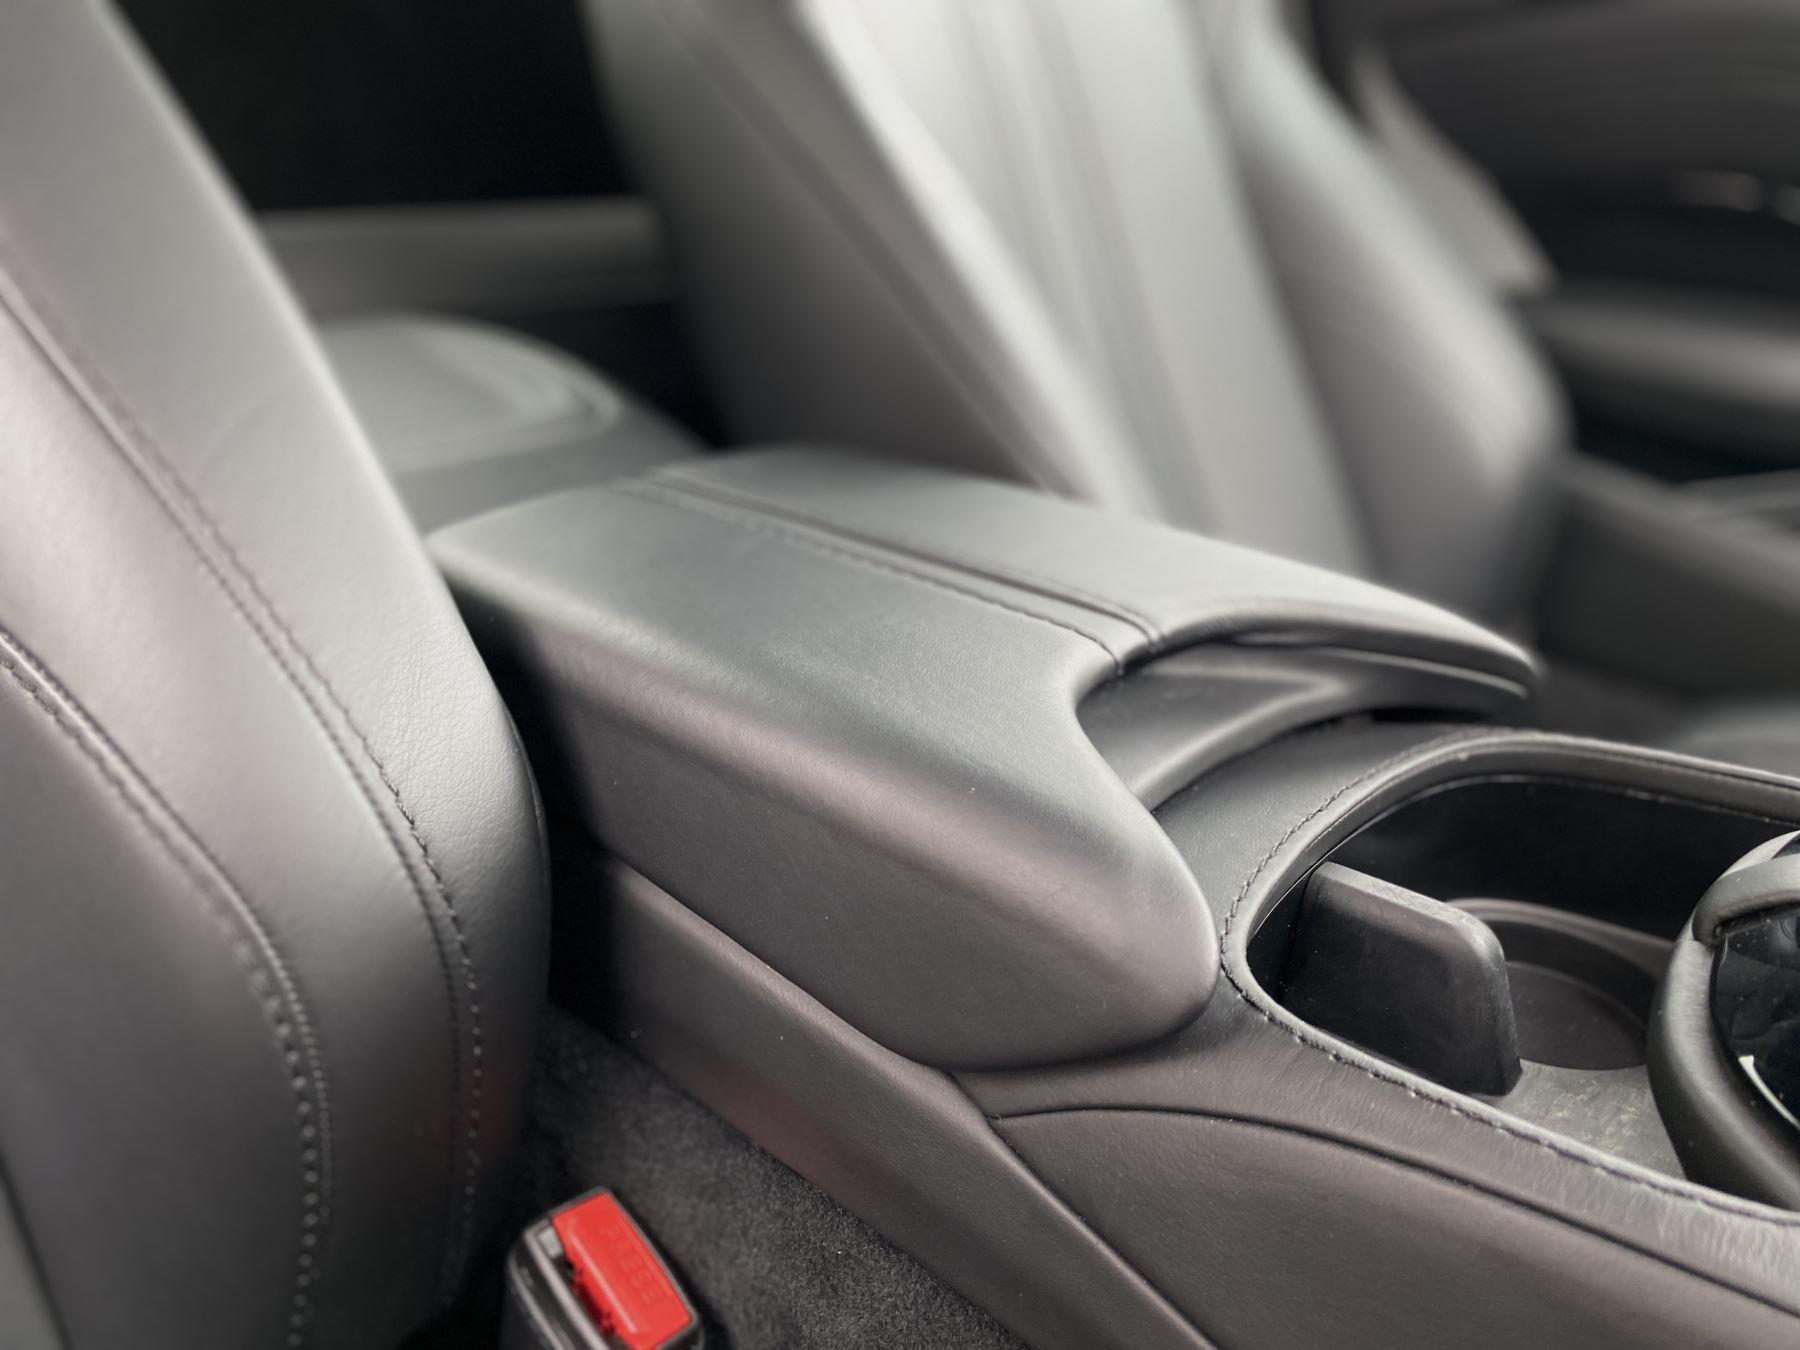 Aston Martin New Vantage 2dr ZF 8 Speed Auto. 4.0 Twin Turbo ZF Gearbox  Reversing Camera Heated Seats Ceramic Brakes image 29